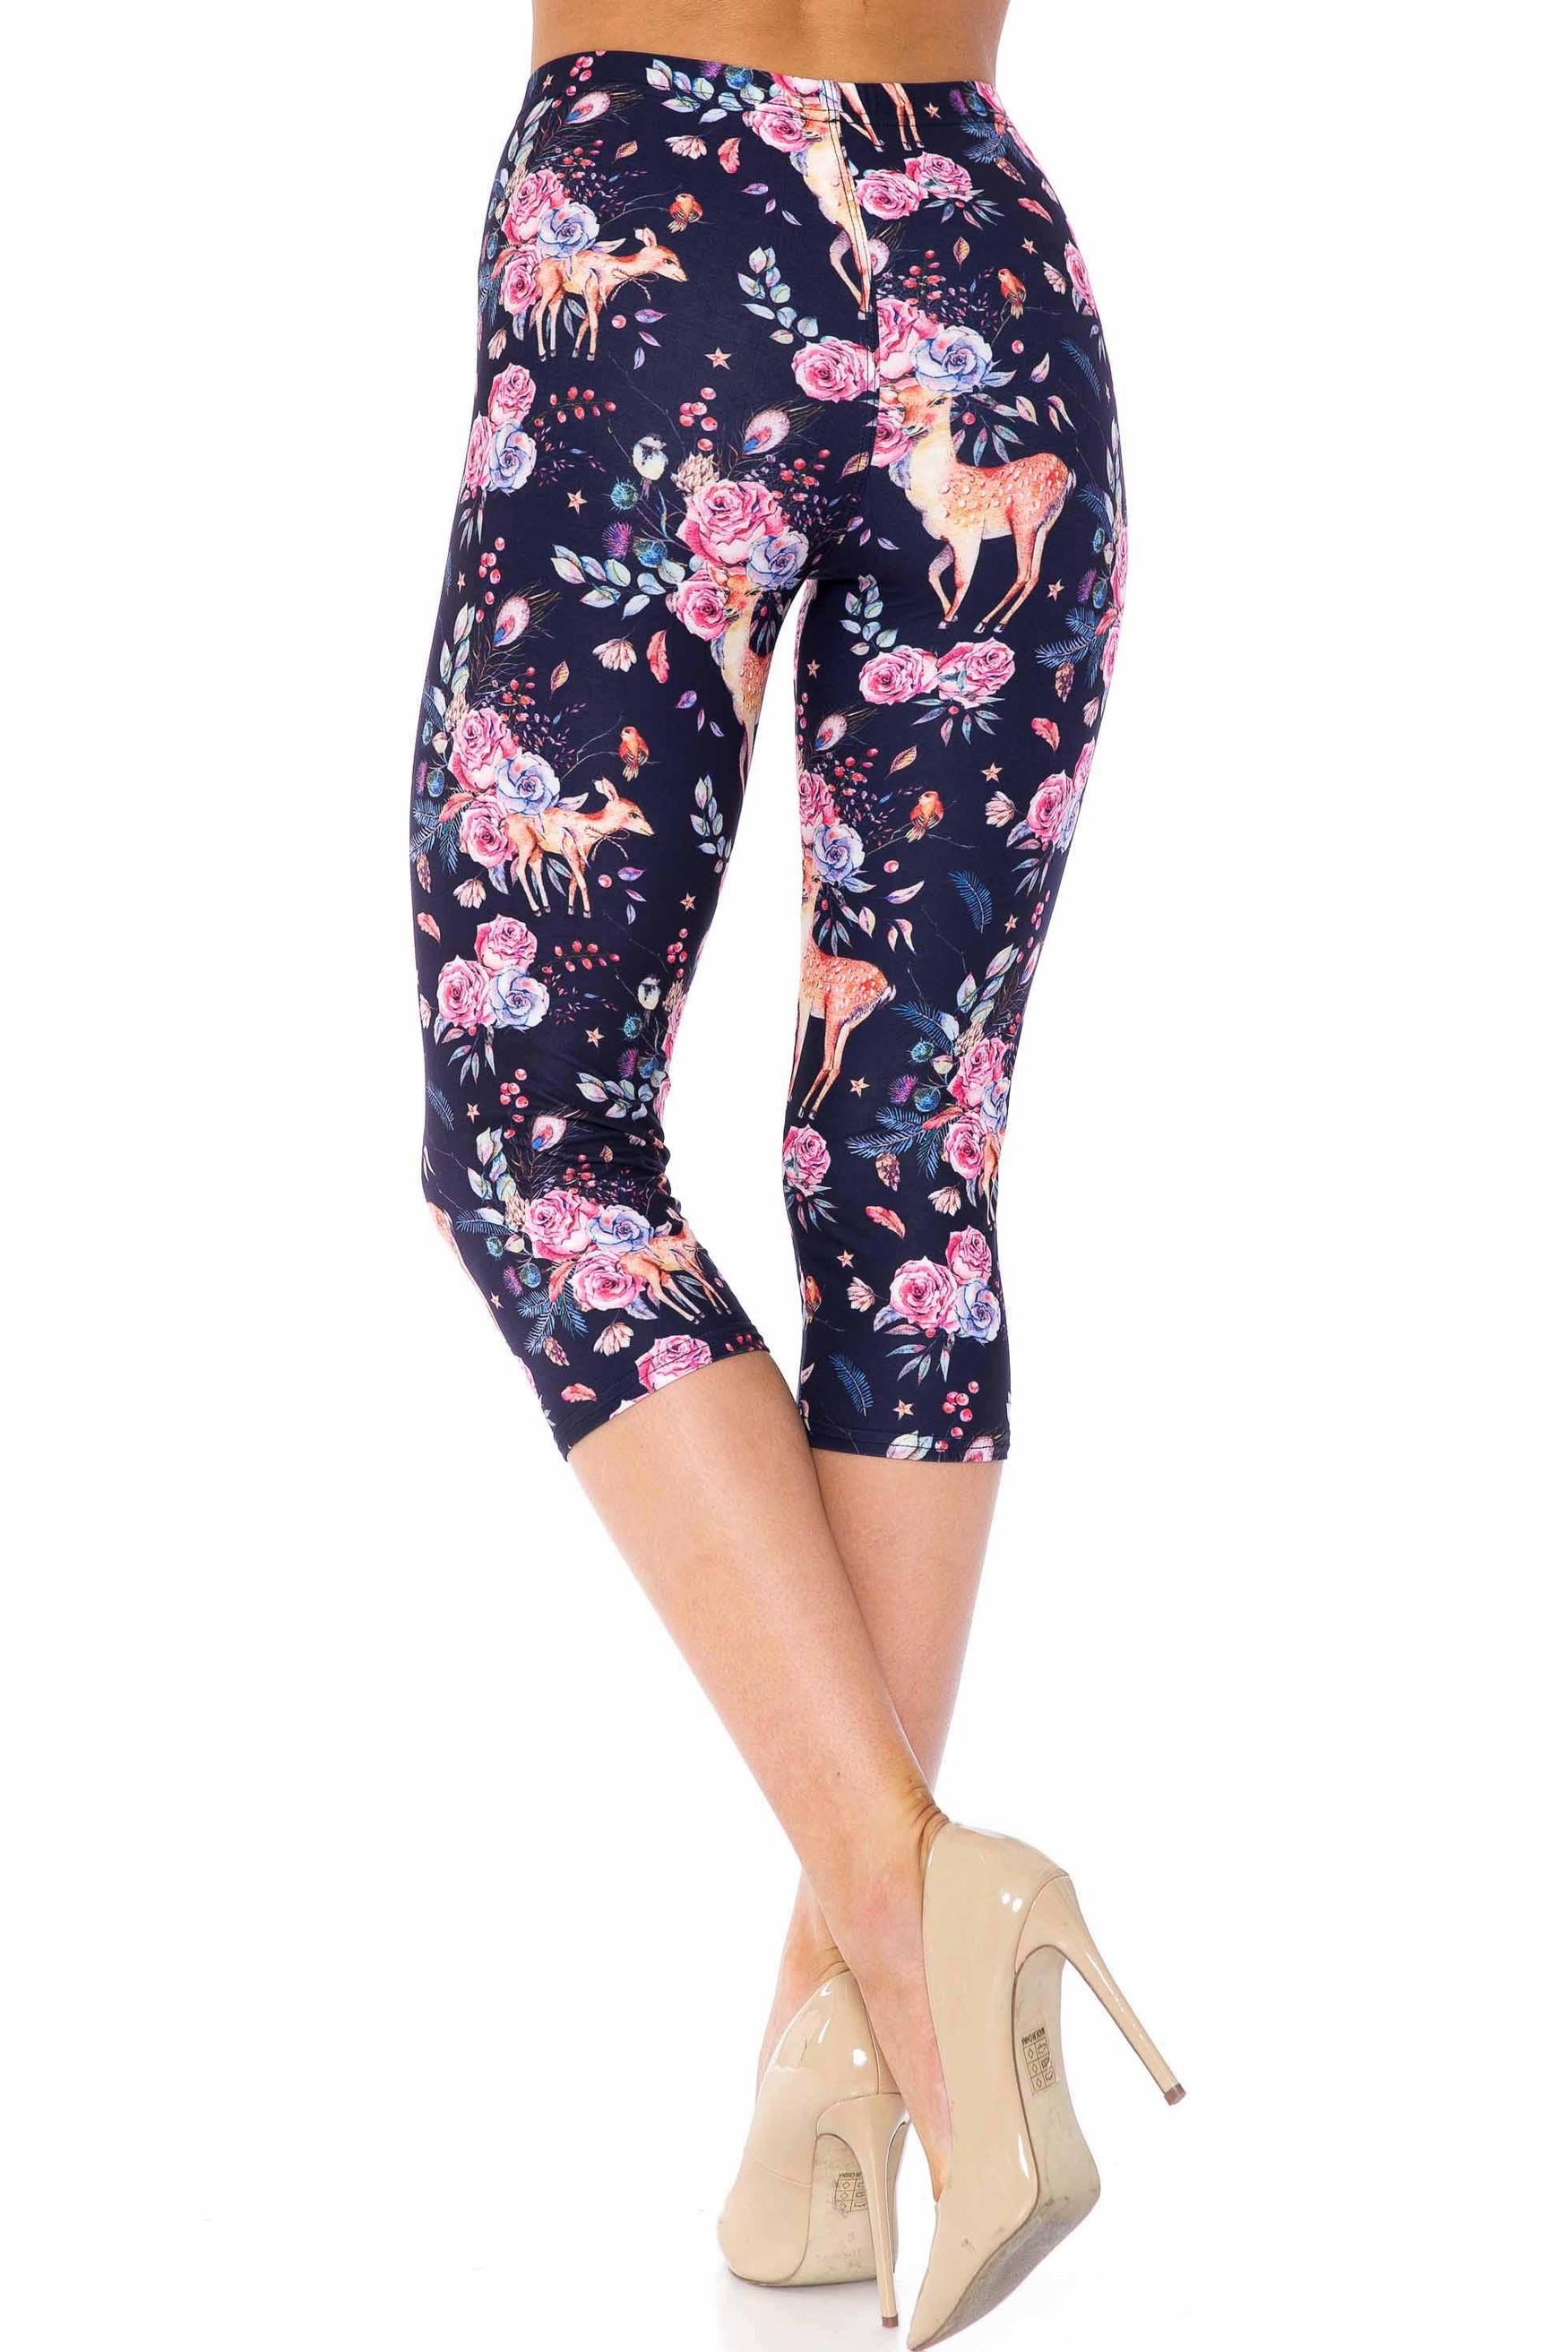 Creamy Soft Woodland Floral Fawn Extra Plus Size Capris - USA Fashion™